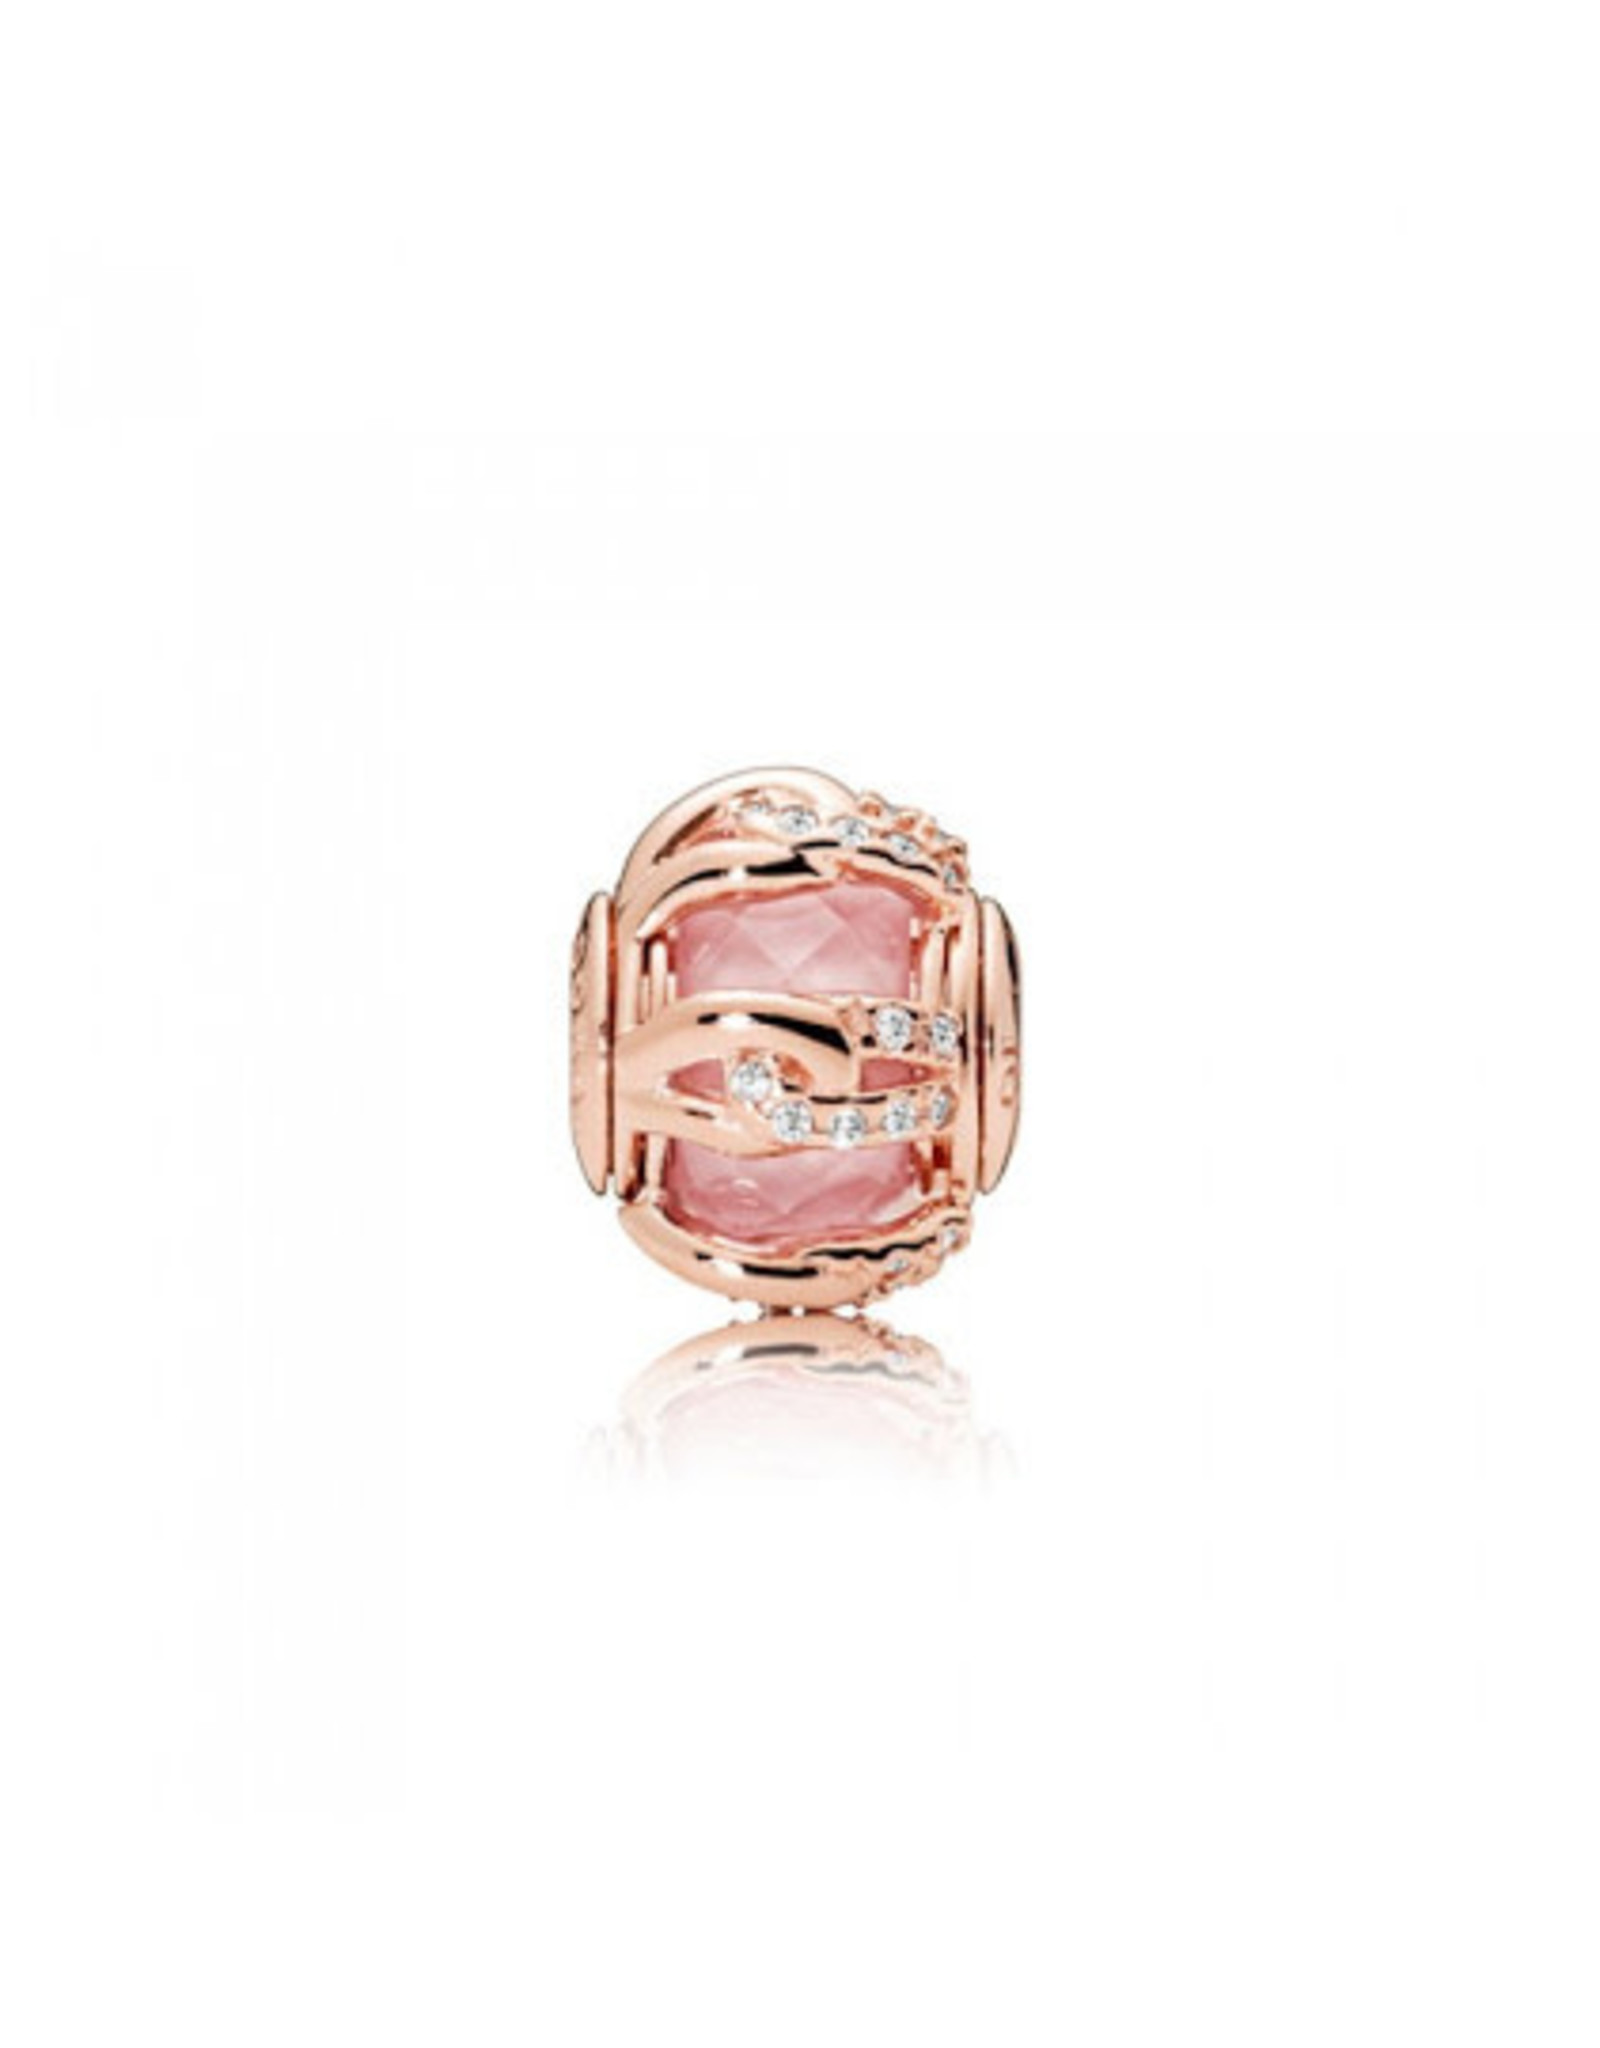 Pandora Pandora Essence Charm, Rose Gold, Bonds Of Love, Pink Crystal